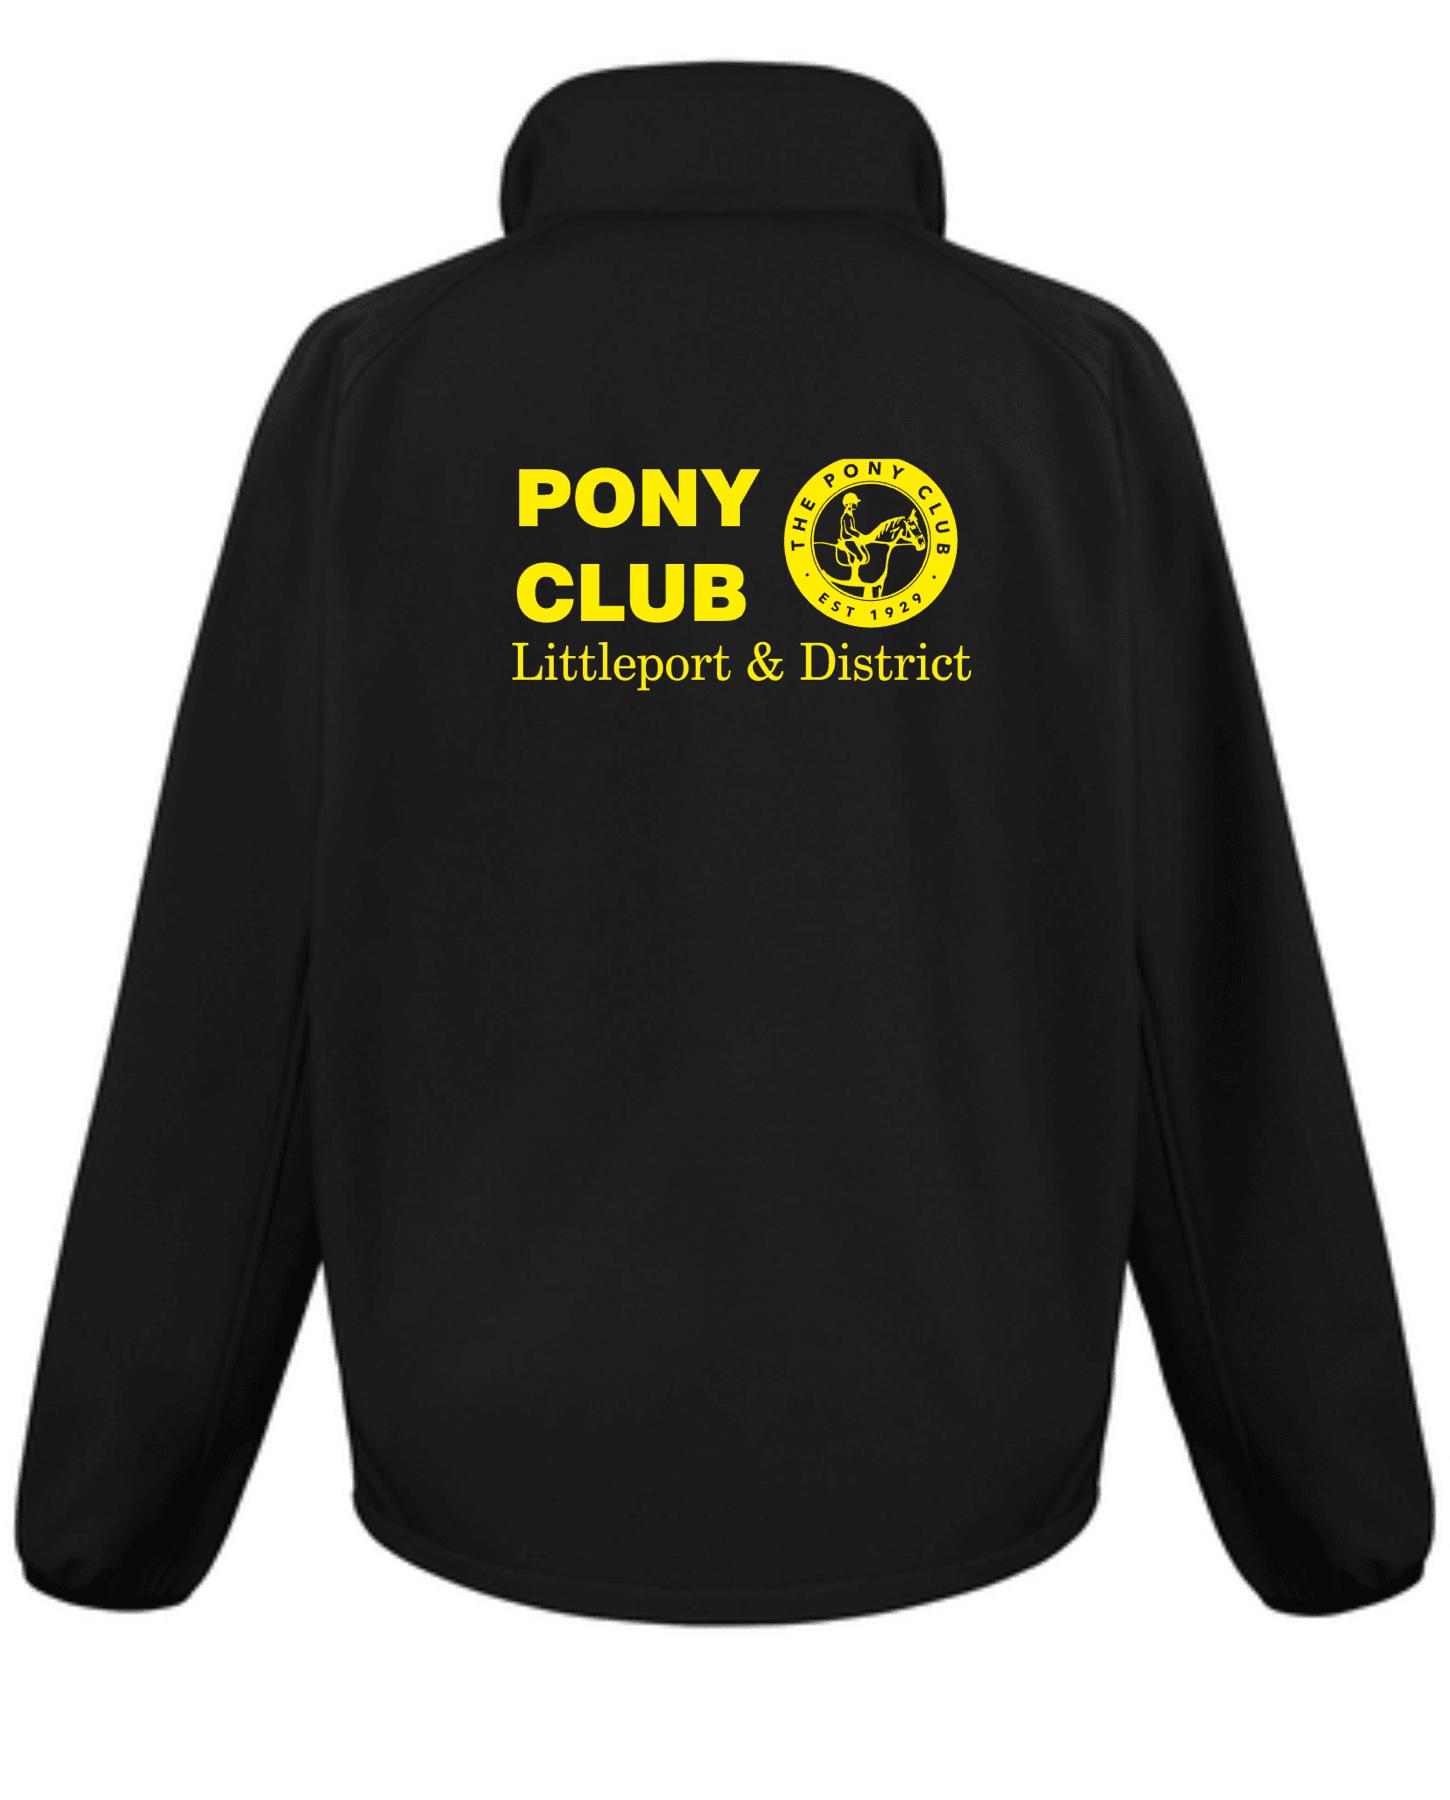 Littleport & District Pony Club – Softshell Ladyfit